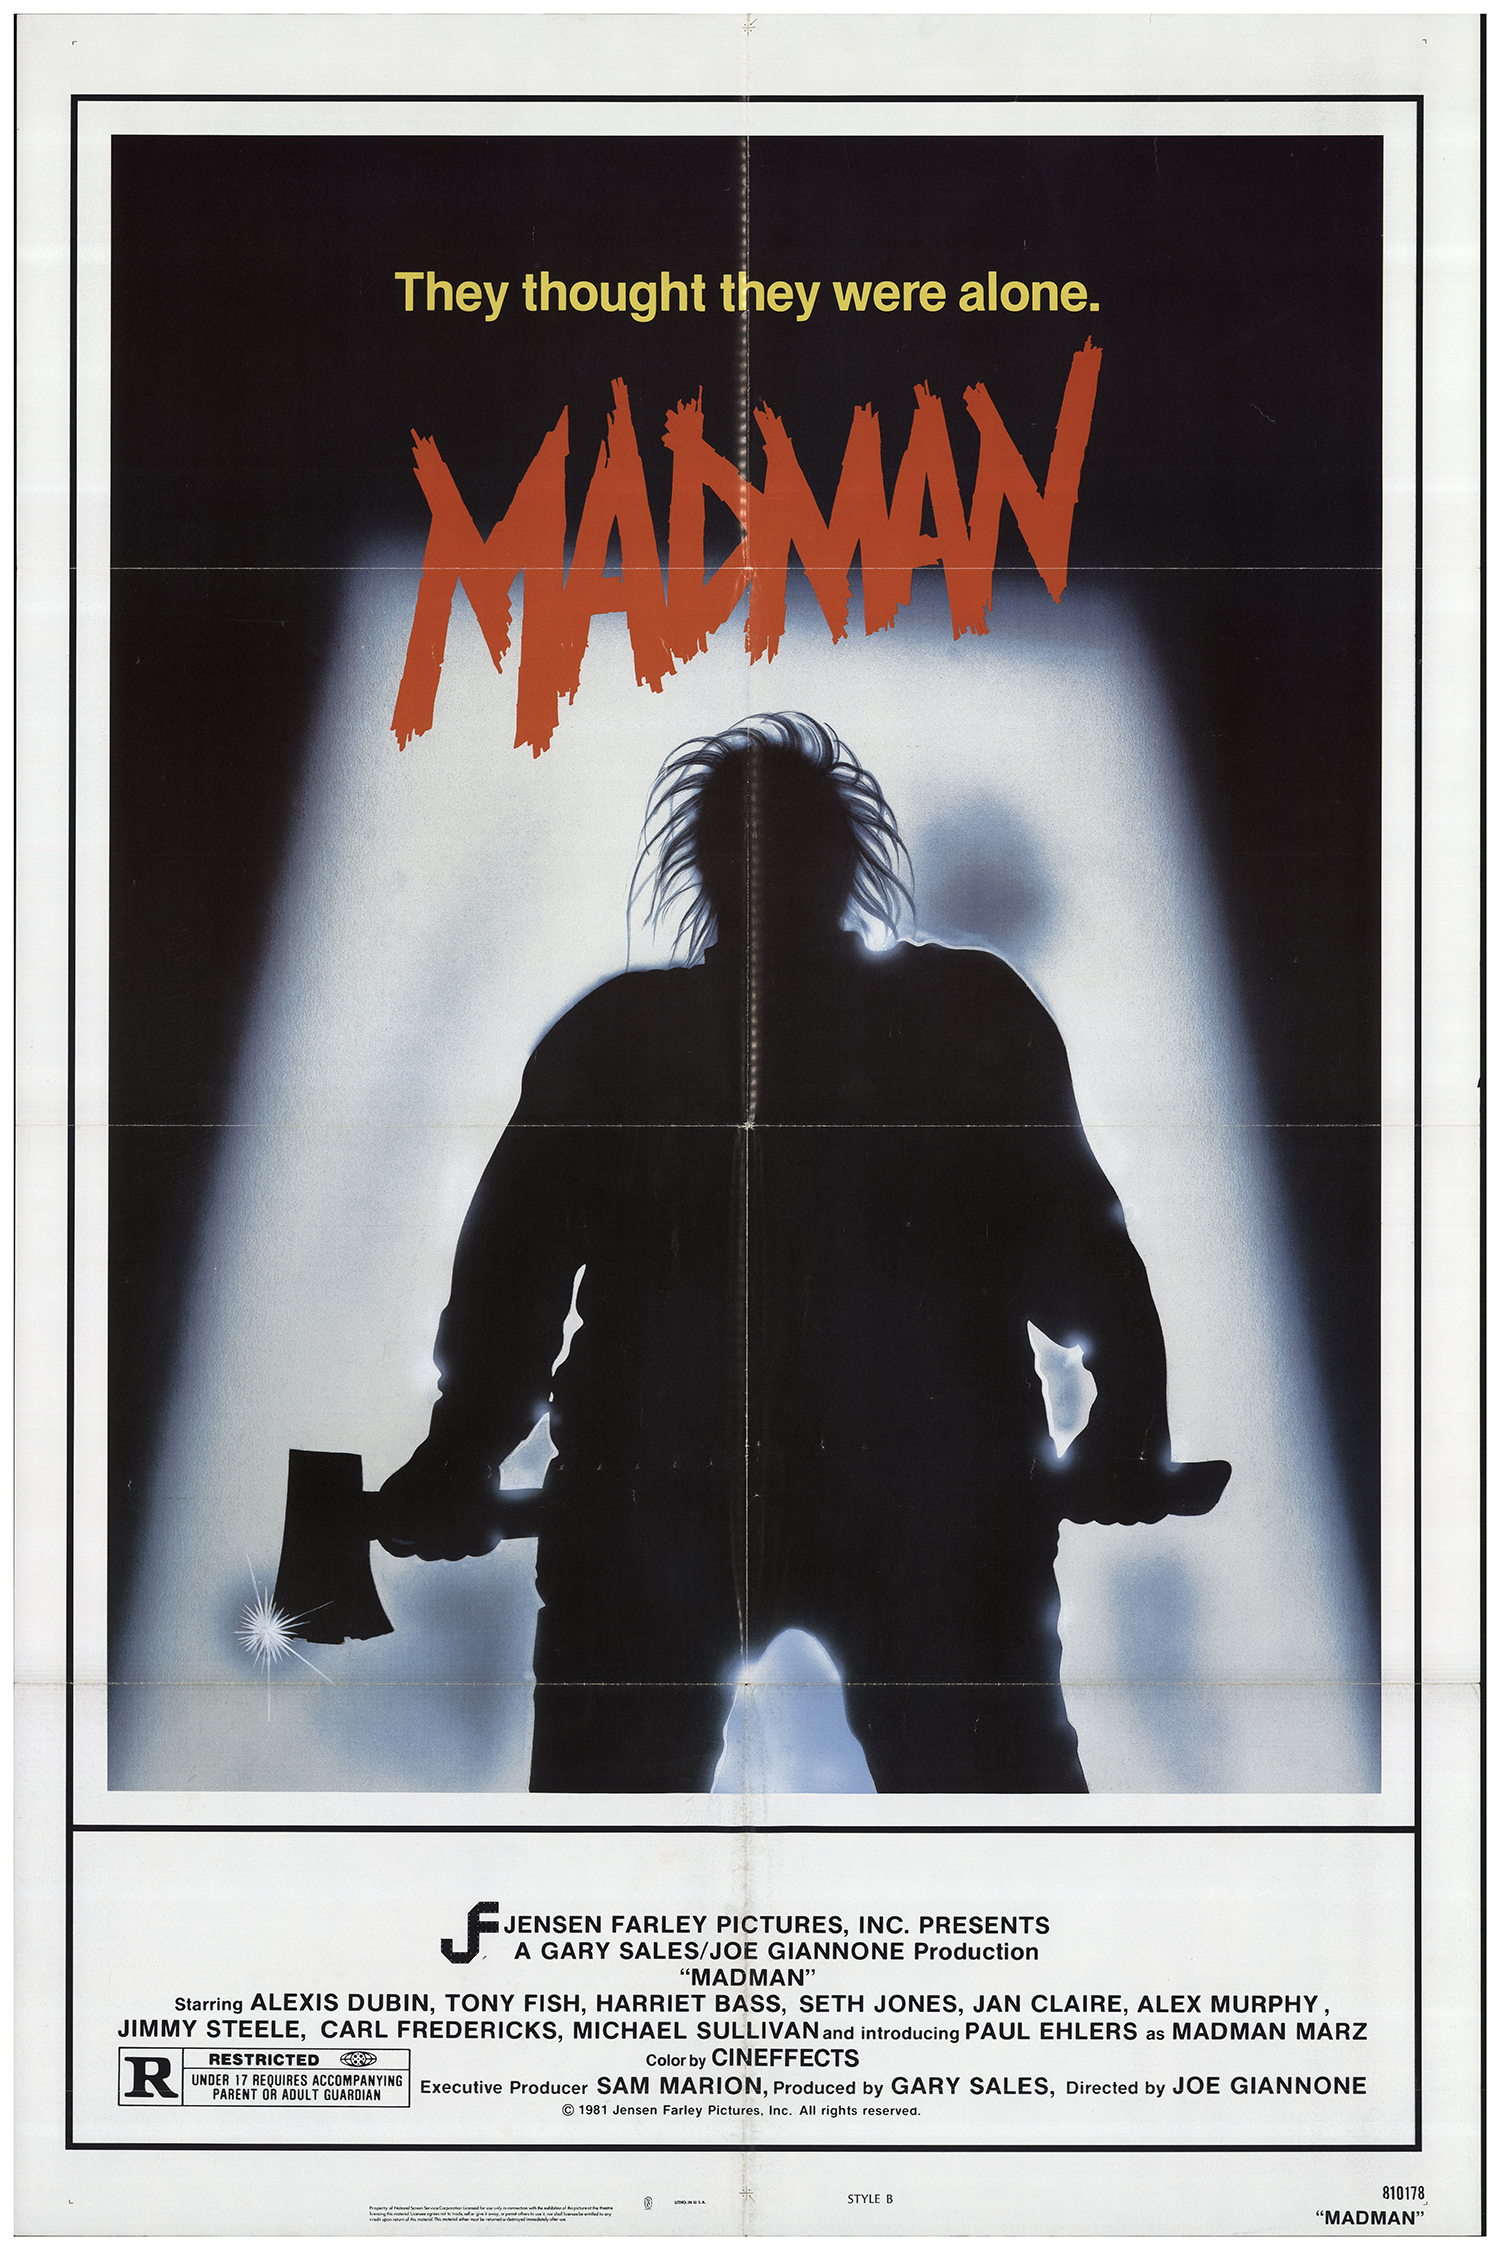 Madman_Poster_1200_1817_81_s.jpg